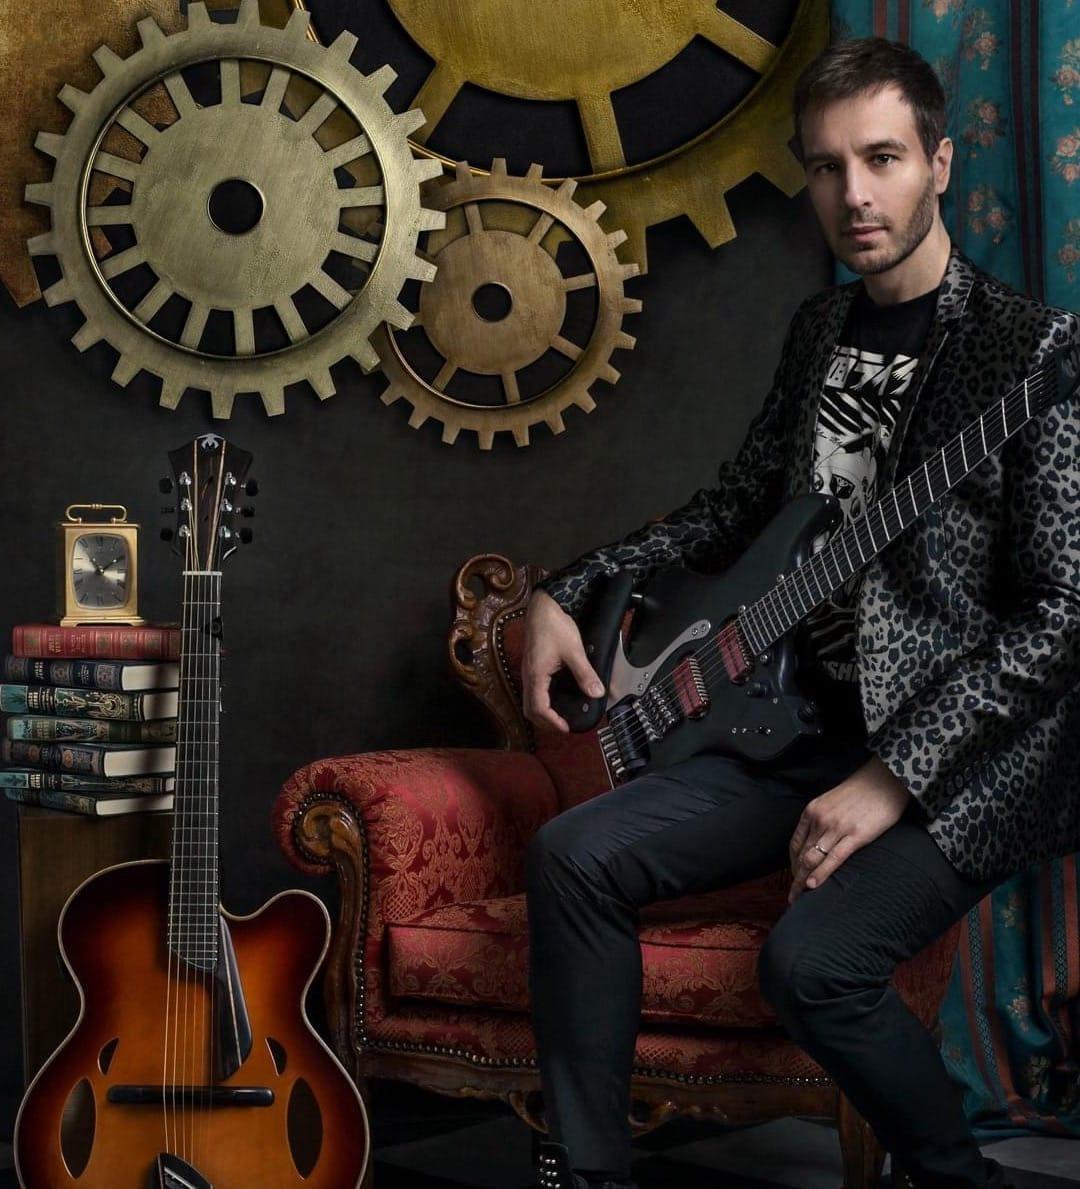 Fabio Mittino with his Mirabella Guitar